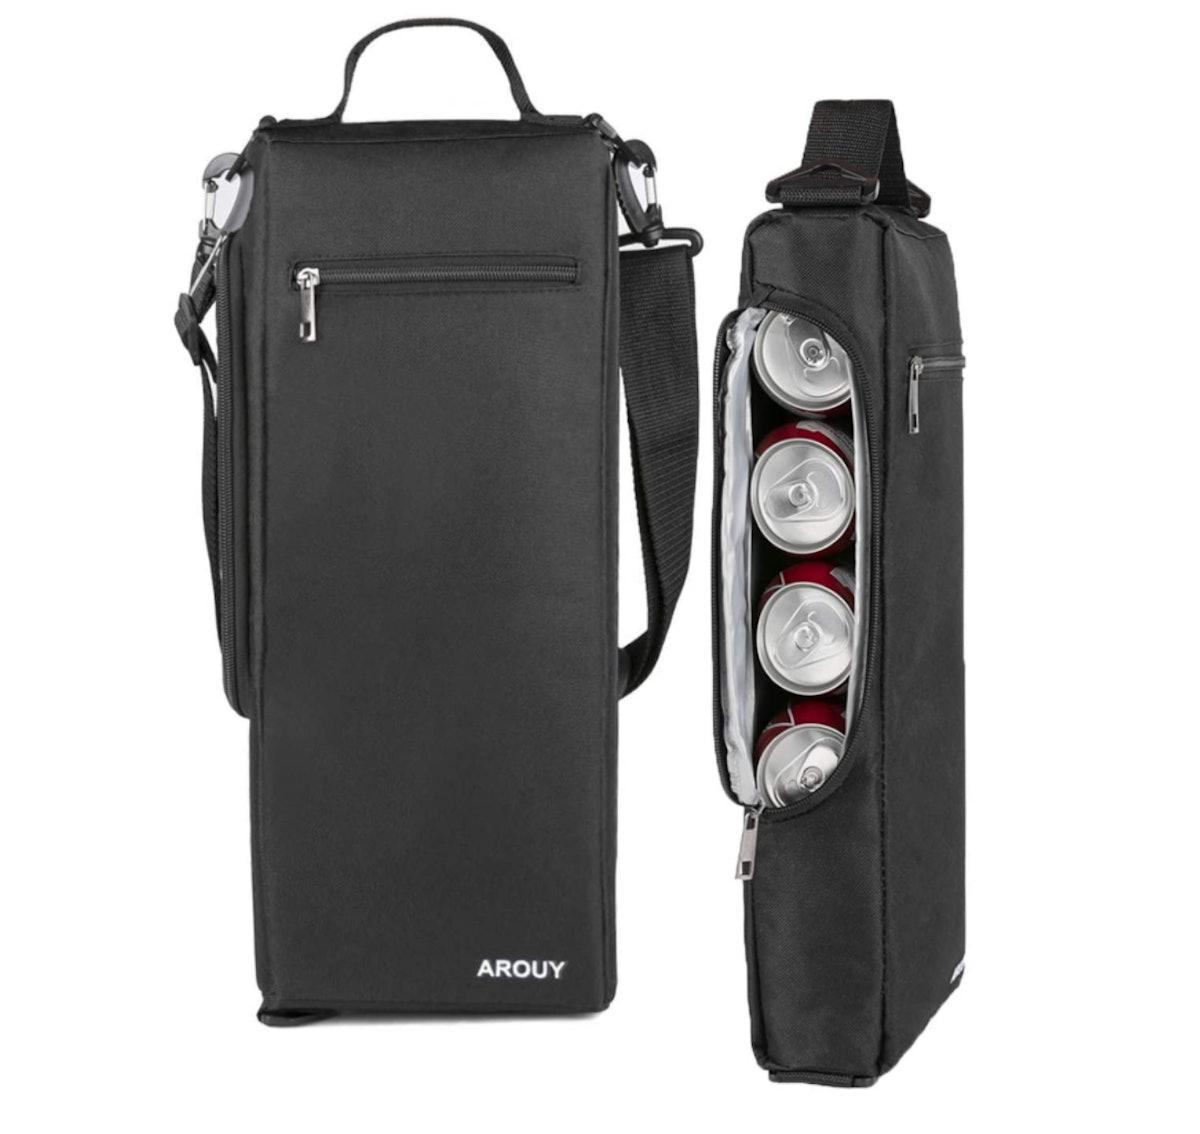 AROUY Golf Cooler Bag